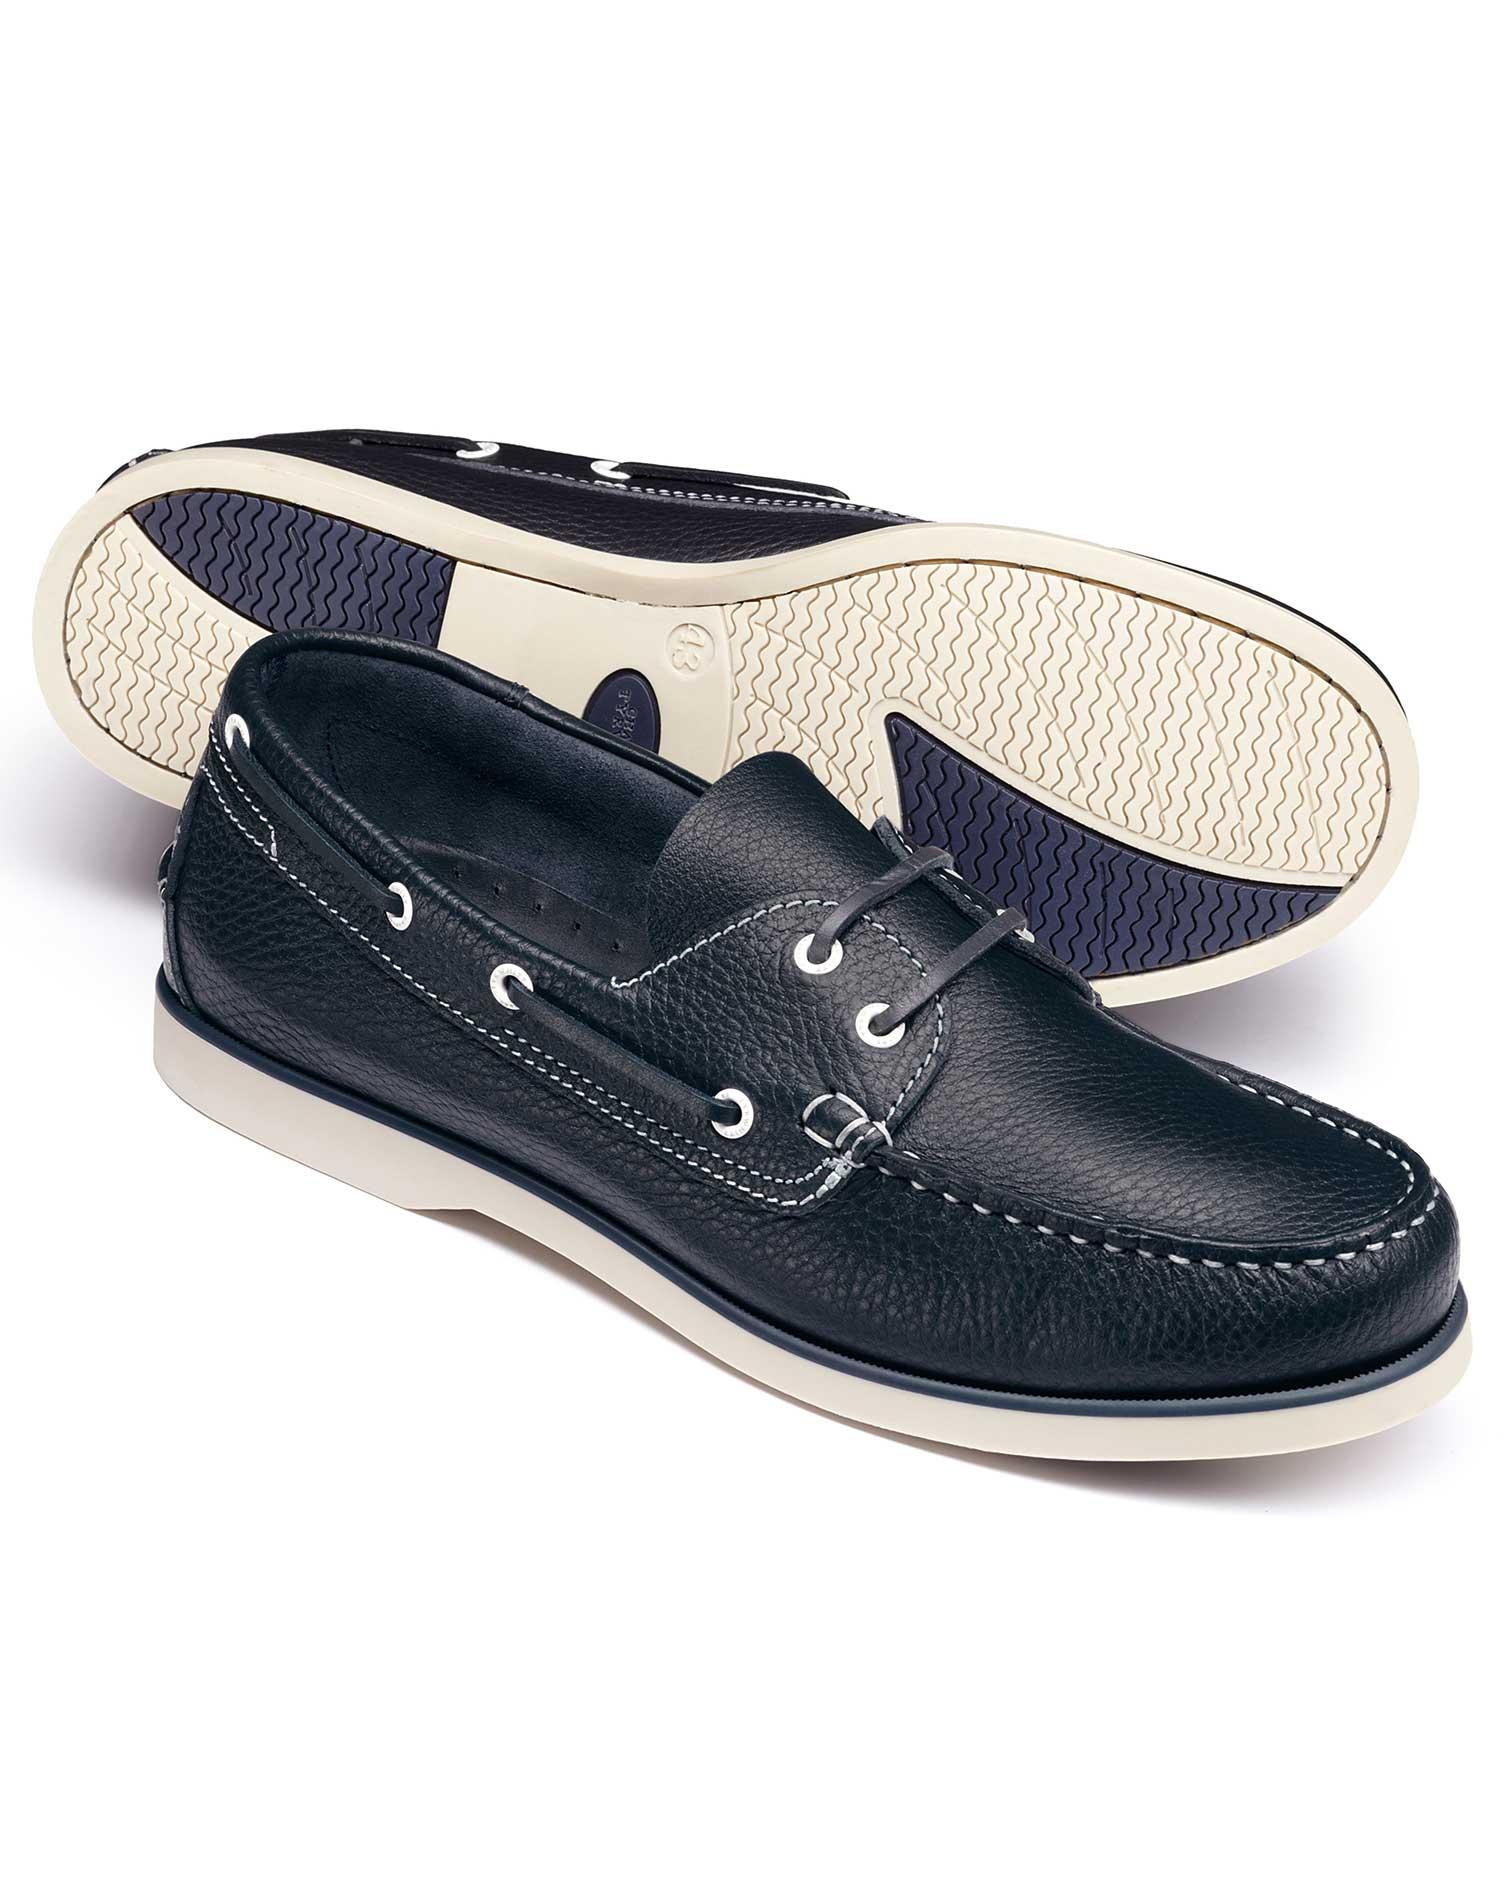 Navy Boat Shoe Size 9 R by Charles Tyrwhitt